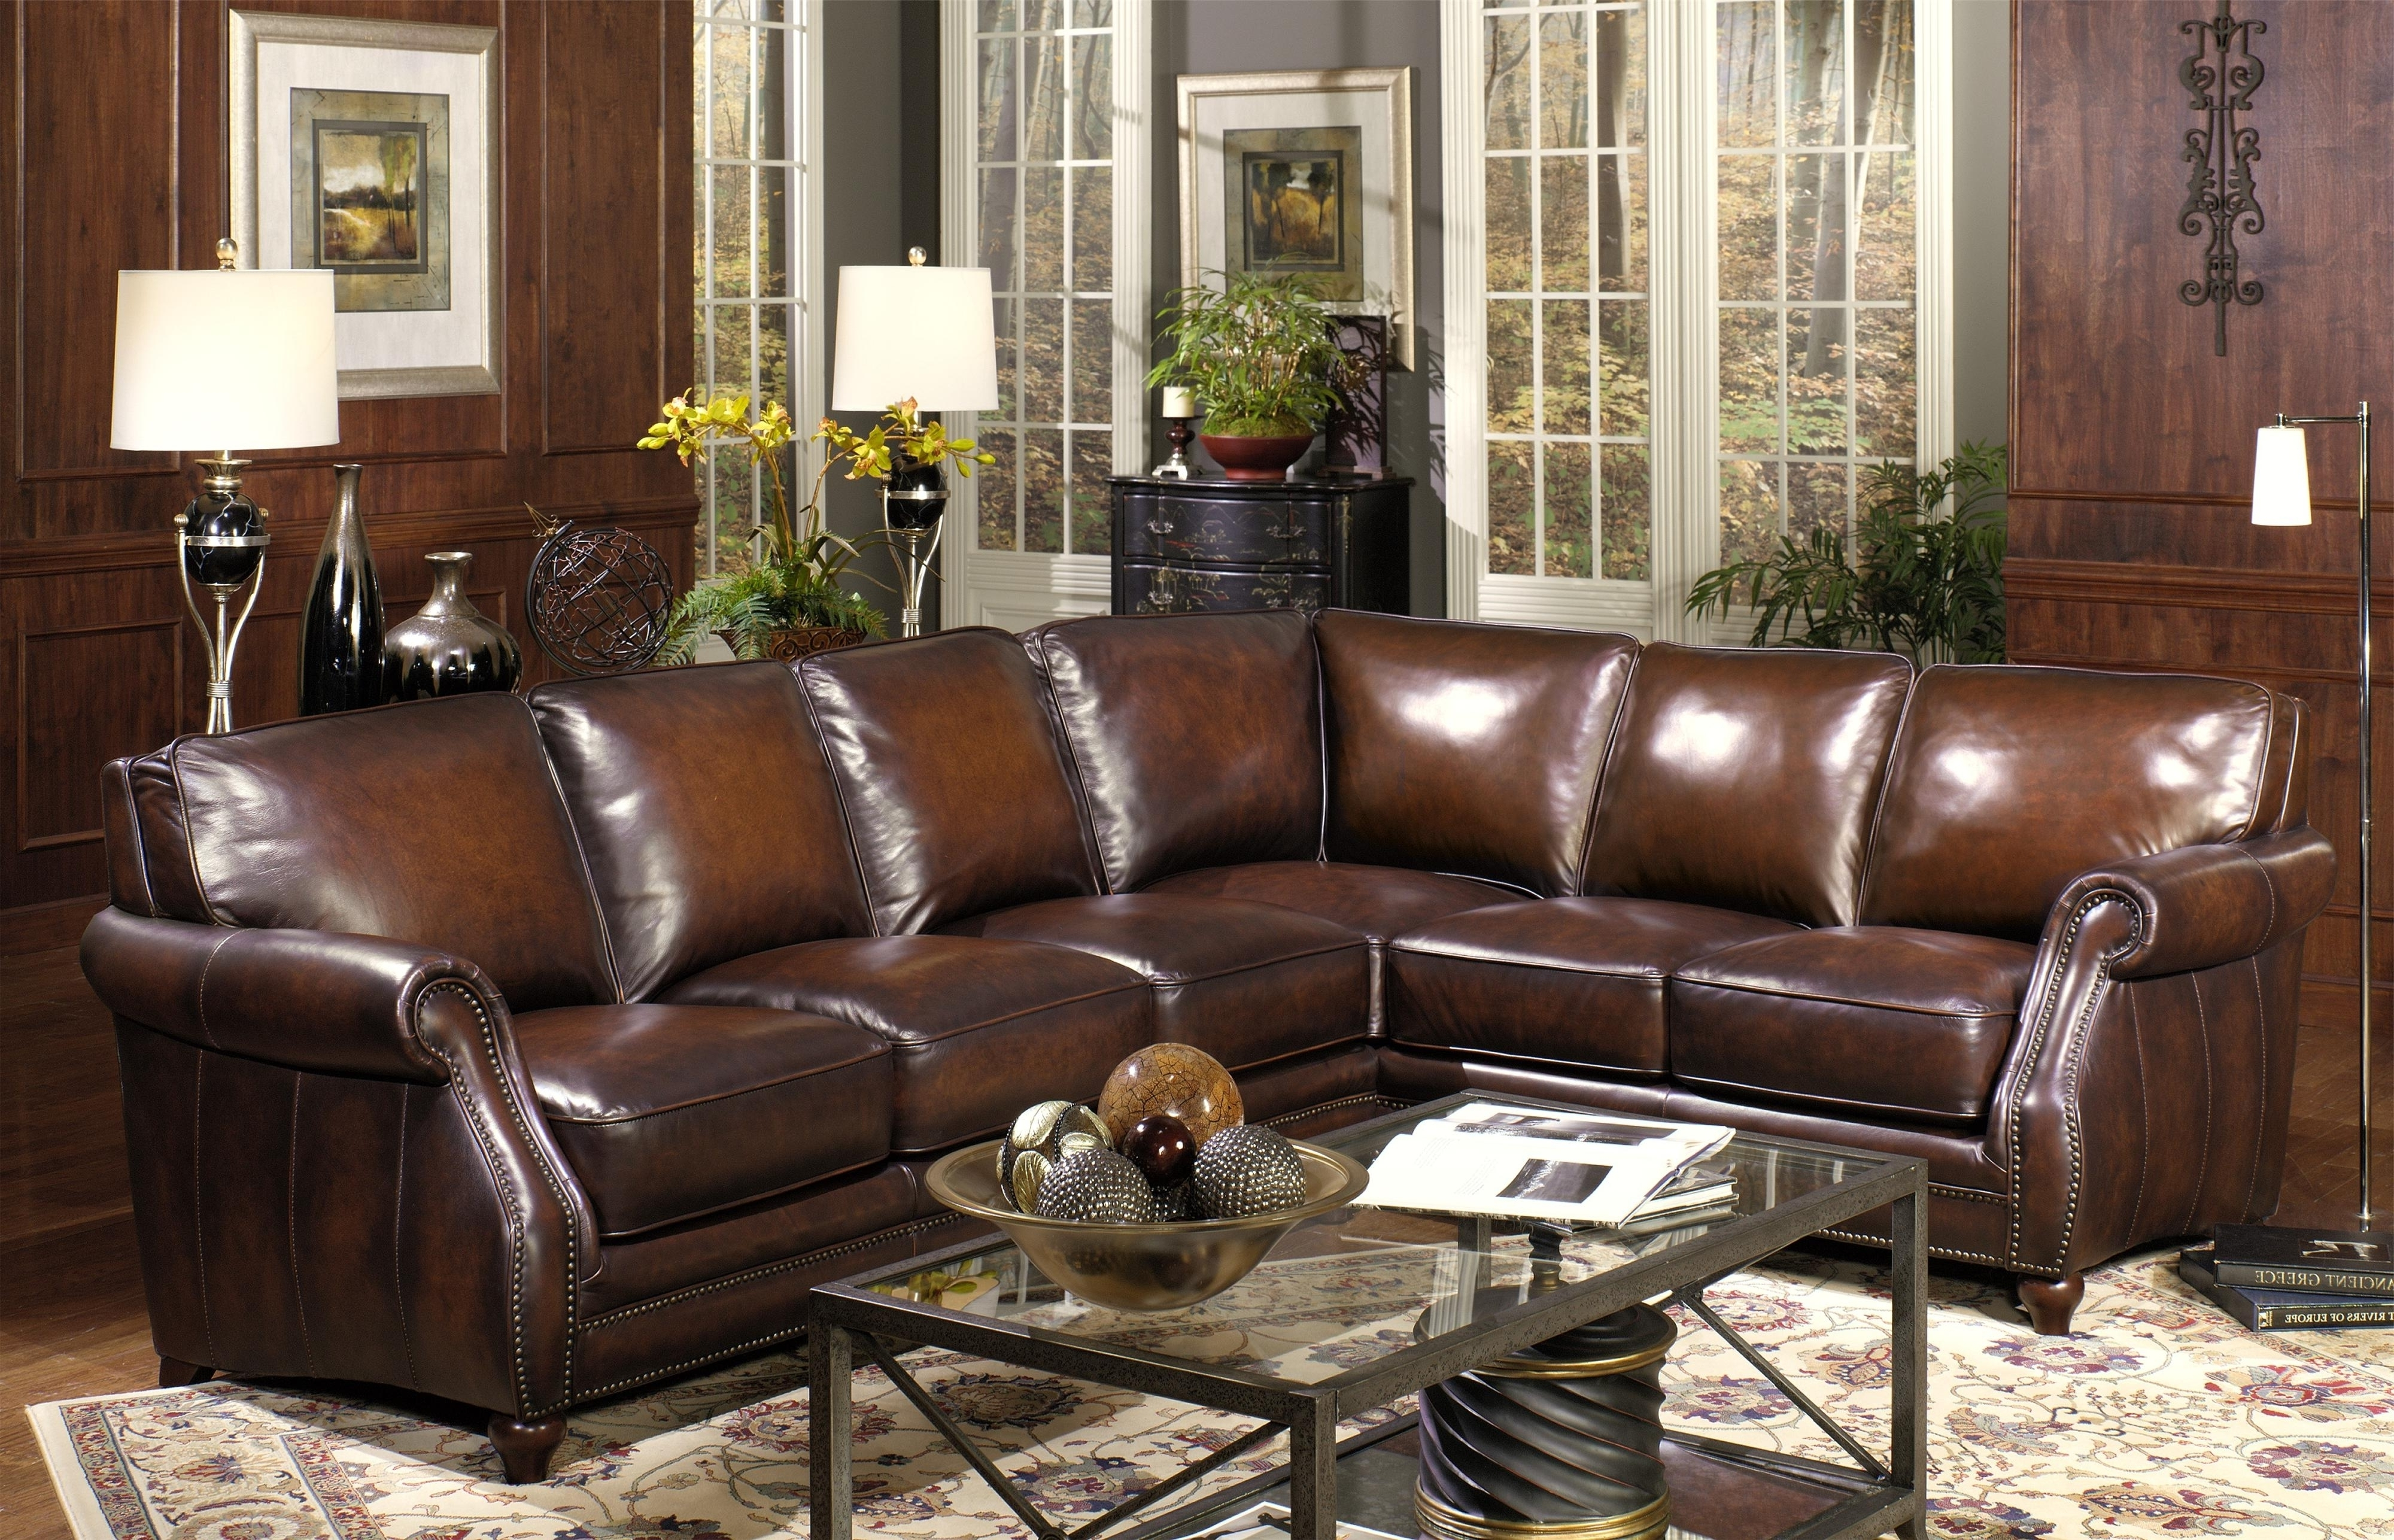 Trendy Elegant Sectional Sofas Throughout Elegant Leather Sectional Sofas San Diego 35 On Gray Modular In (View 12 of 15)